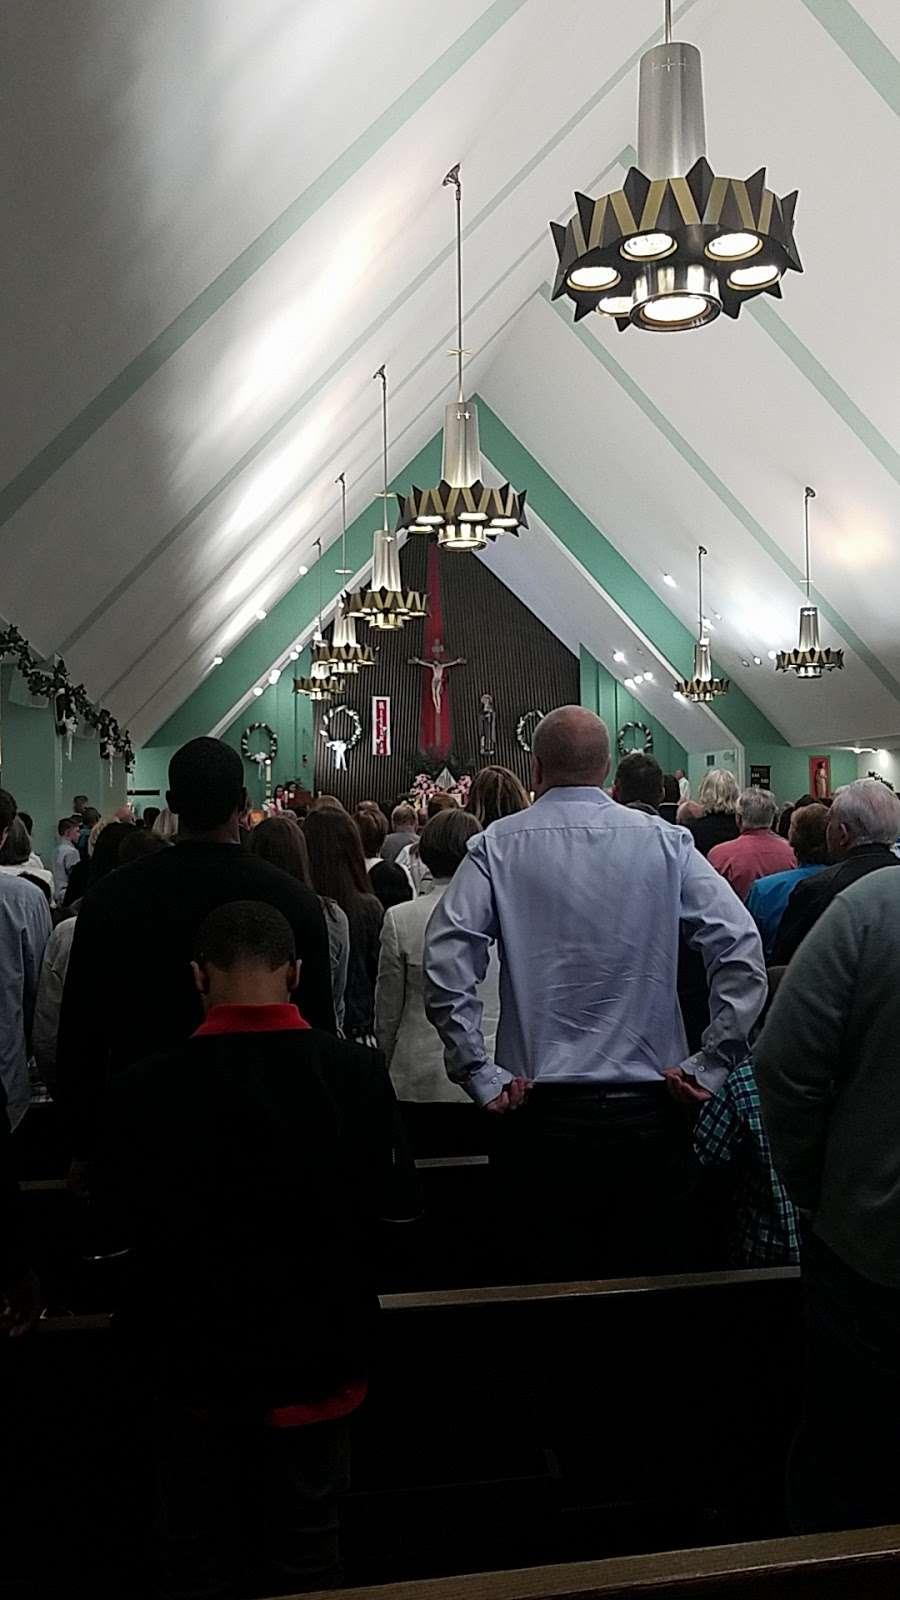 St Margaret of Cortona Church - church    Photo 3 of 3   Address: 6000 Riverdale Ave, Bronx, NY 10471, USA   Phone: (718) 549-8053